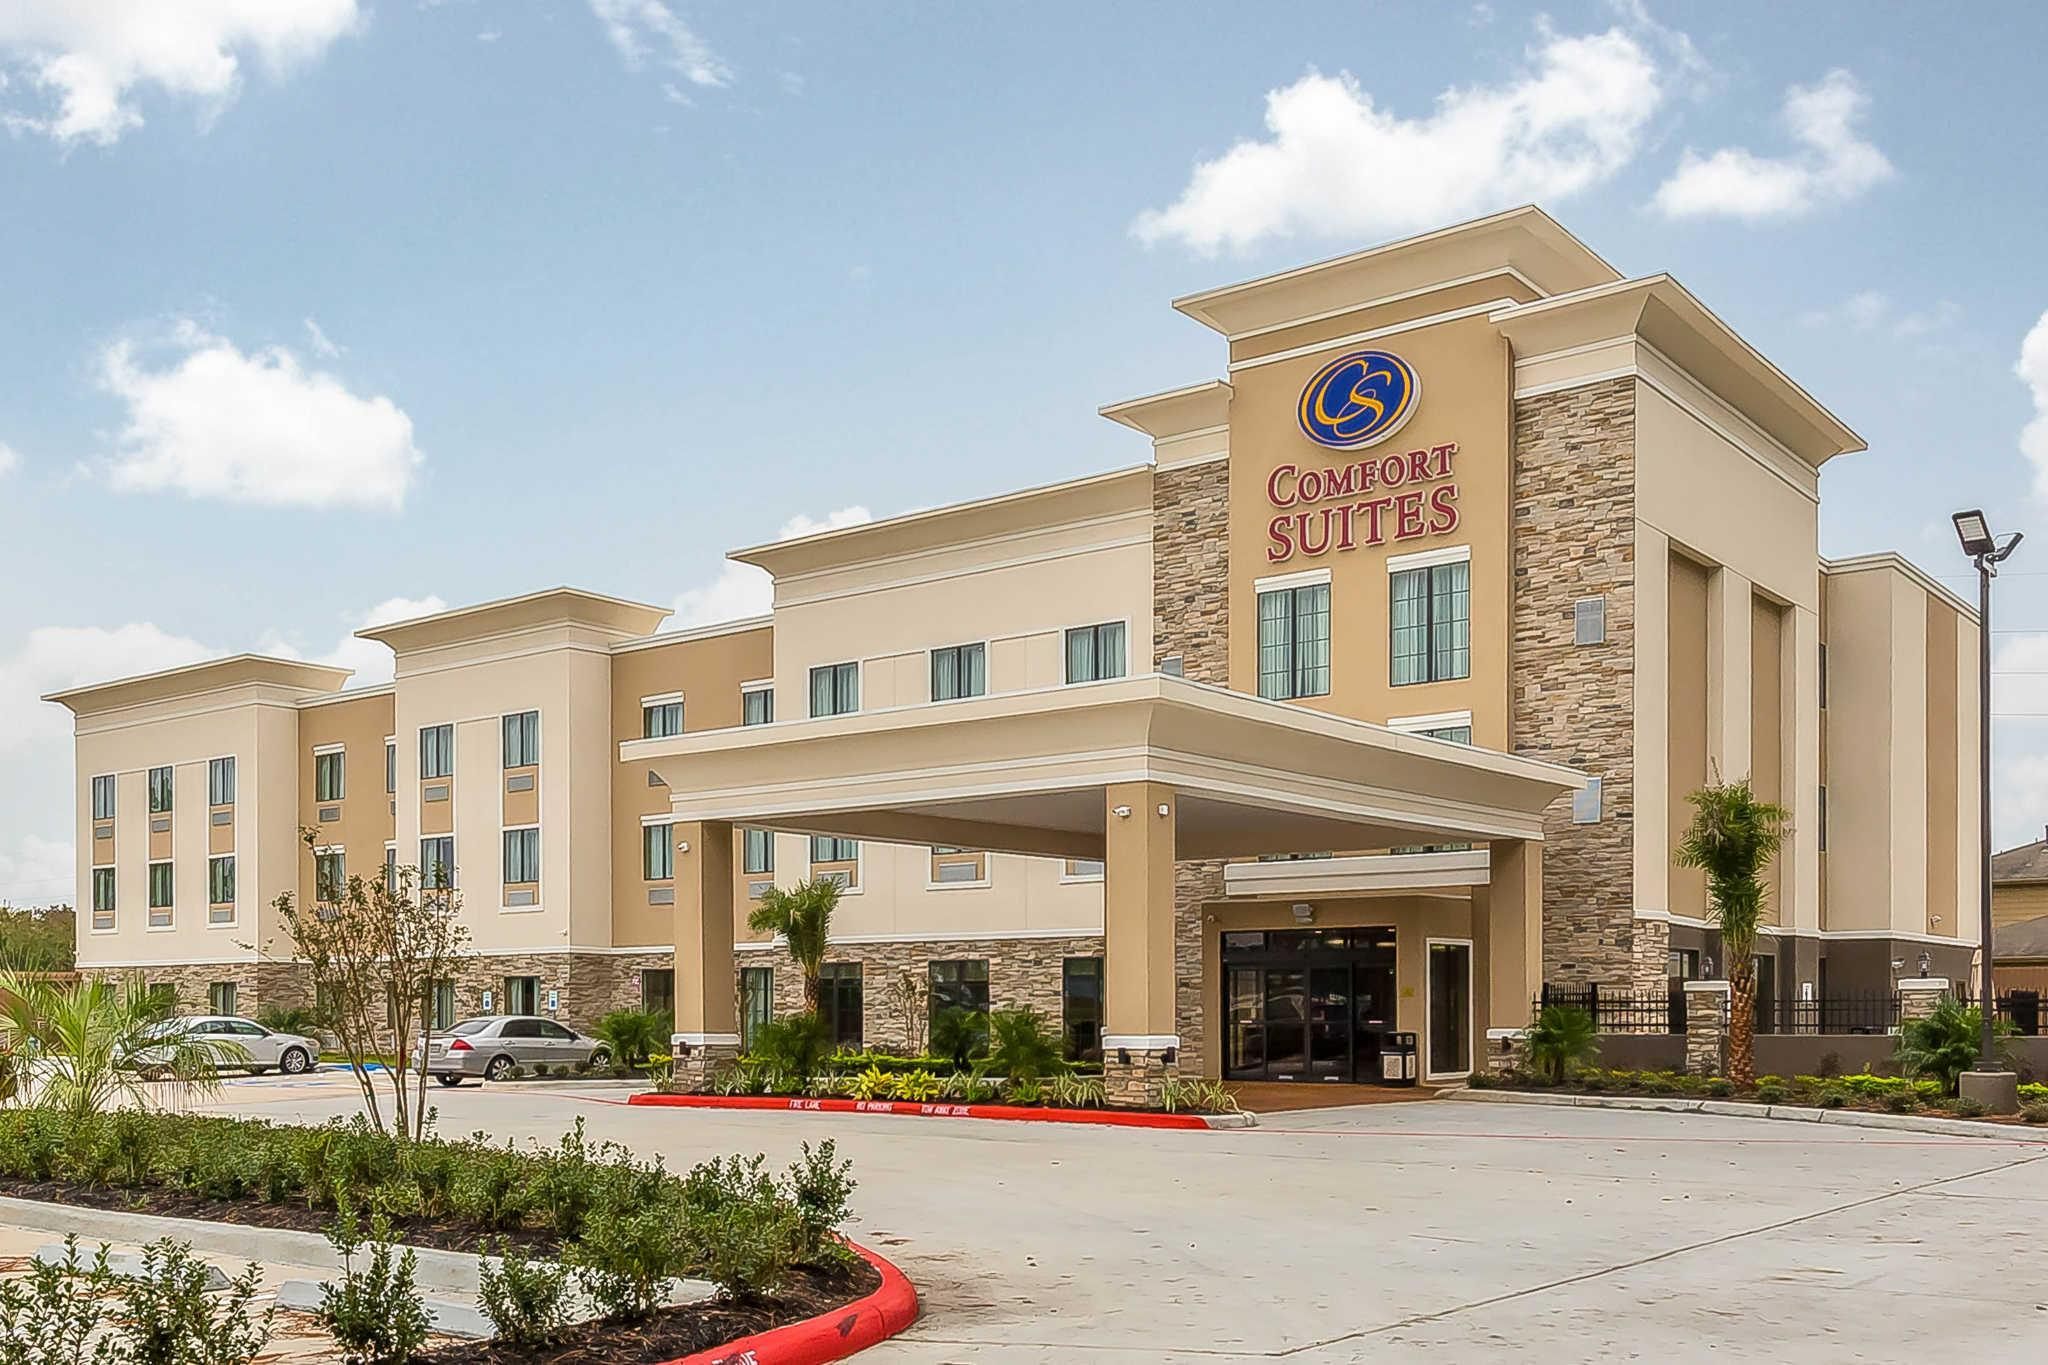 comfort suites houston i 45 houston texas united states rh chiangdao com